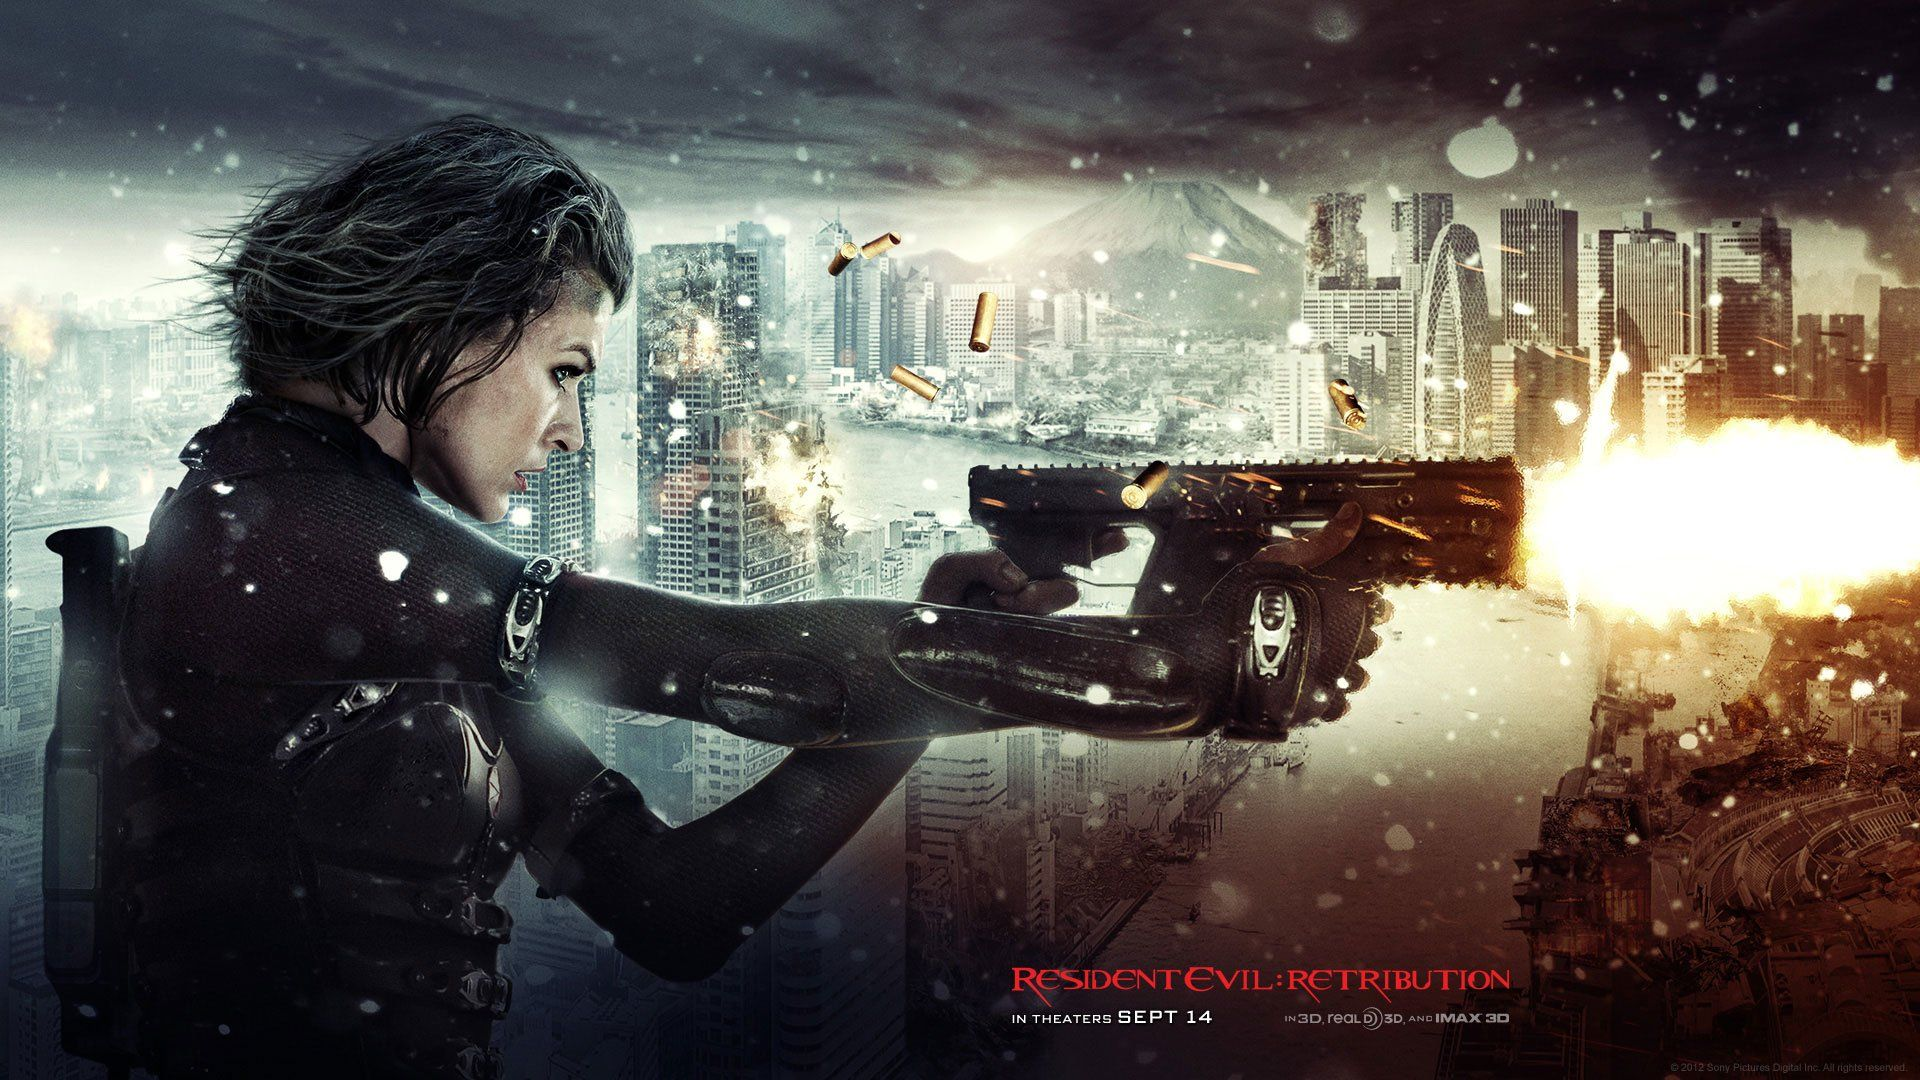 Películas Resident Evil 5: La Venganza Resident Evil Fondo